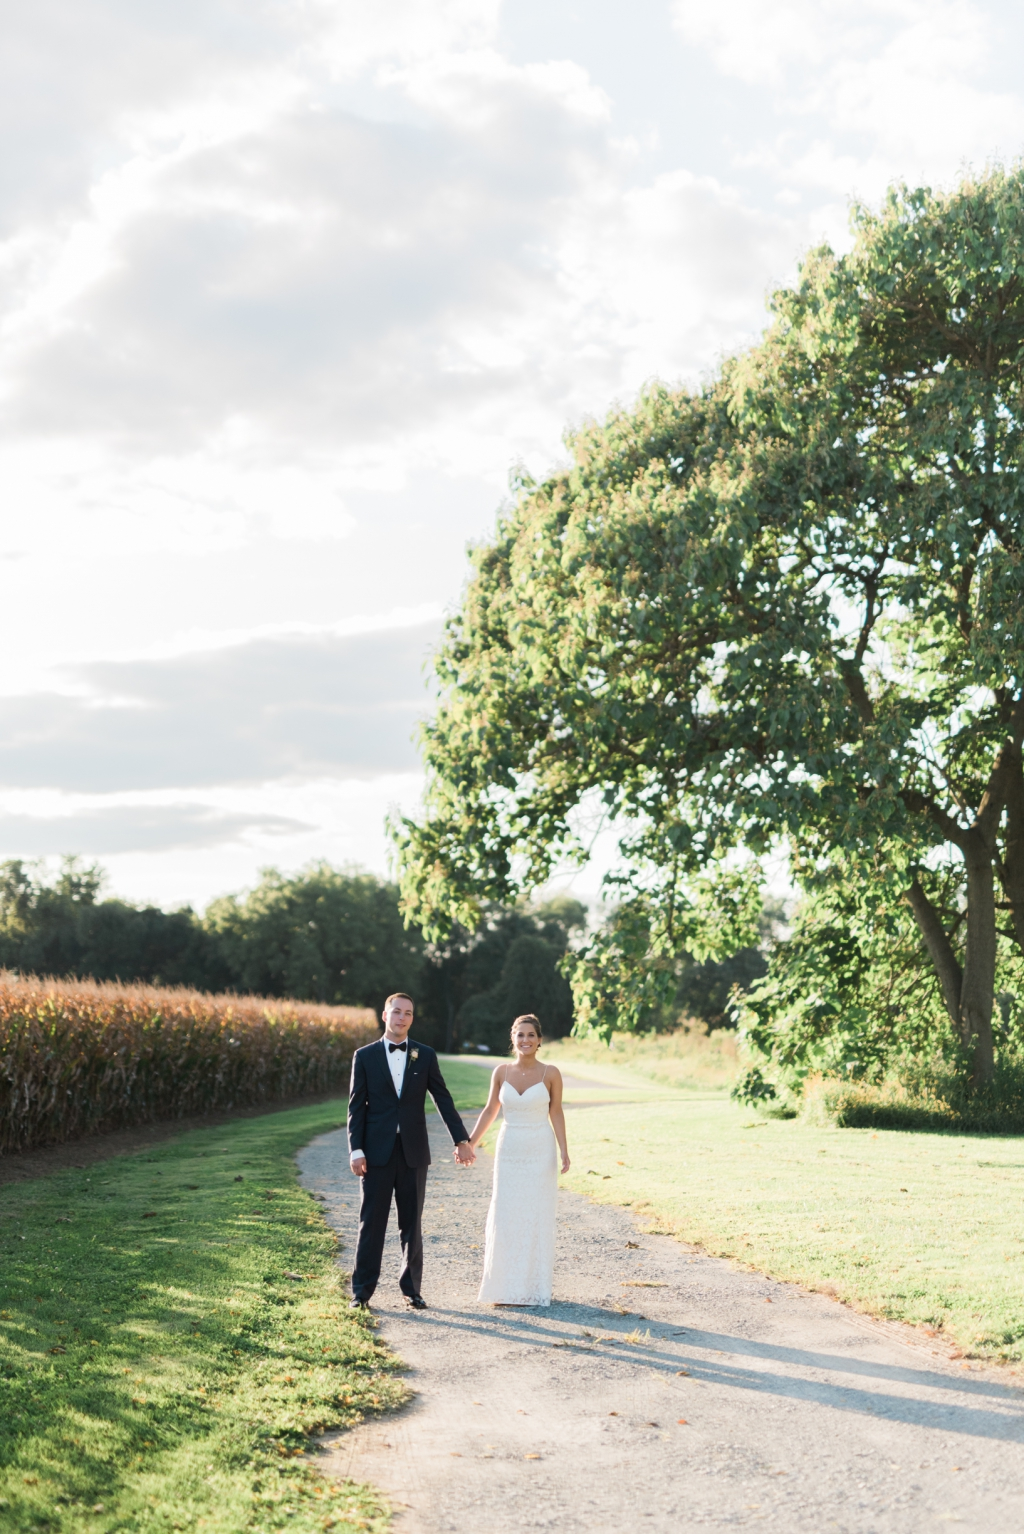 haley-richter-photography-buena-vista-confrence-center-wedding-summer-149